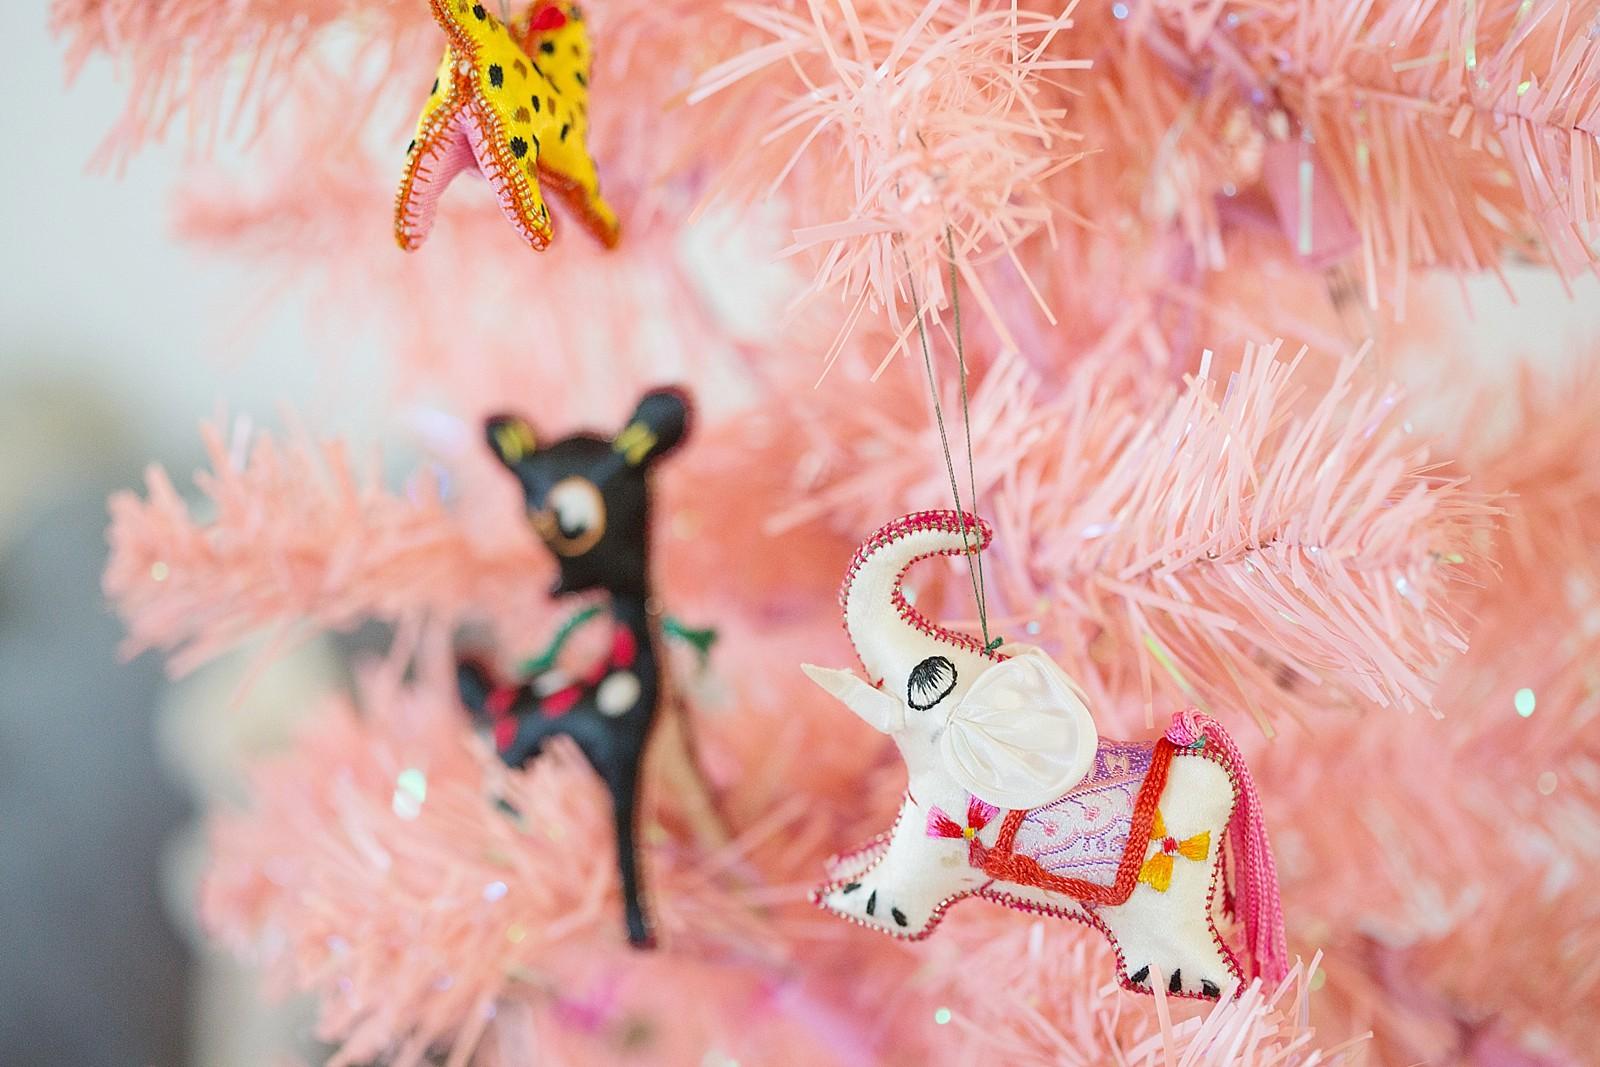 minted-christmas-inspiration-girls-party-photos-diana-elizabeth-blog-lifestyle-hostess-entertainment-home-blog-2303